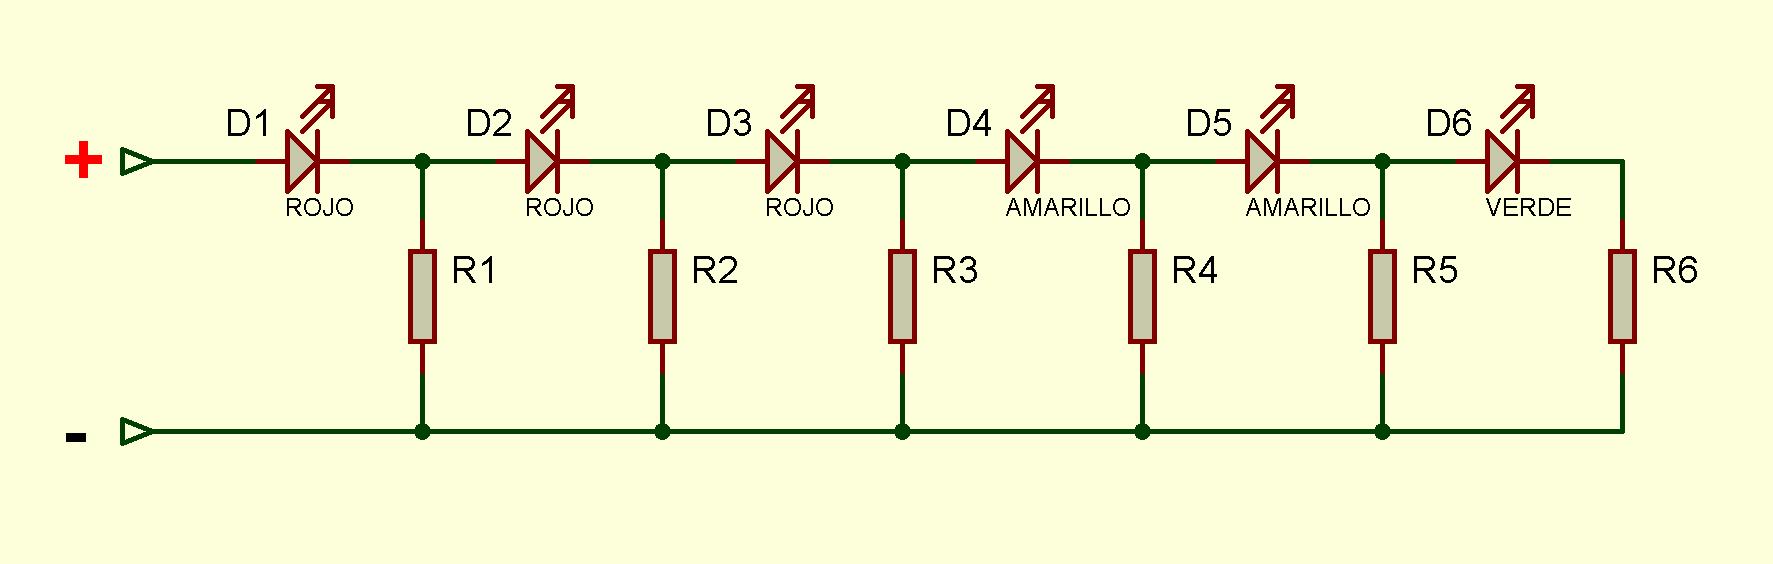 Fig.1. Esquema del circuito. #RevistaTino. Indicador cualitativo